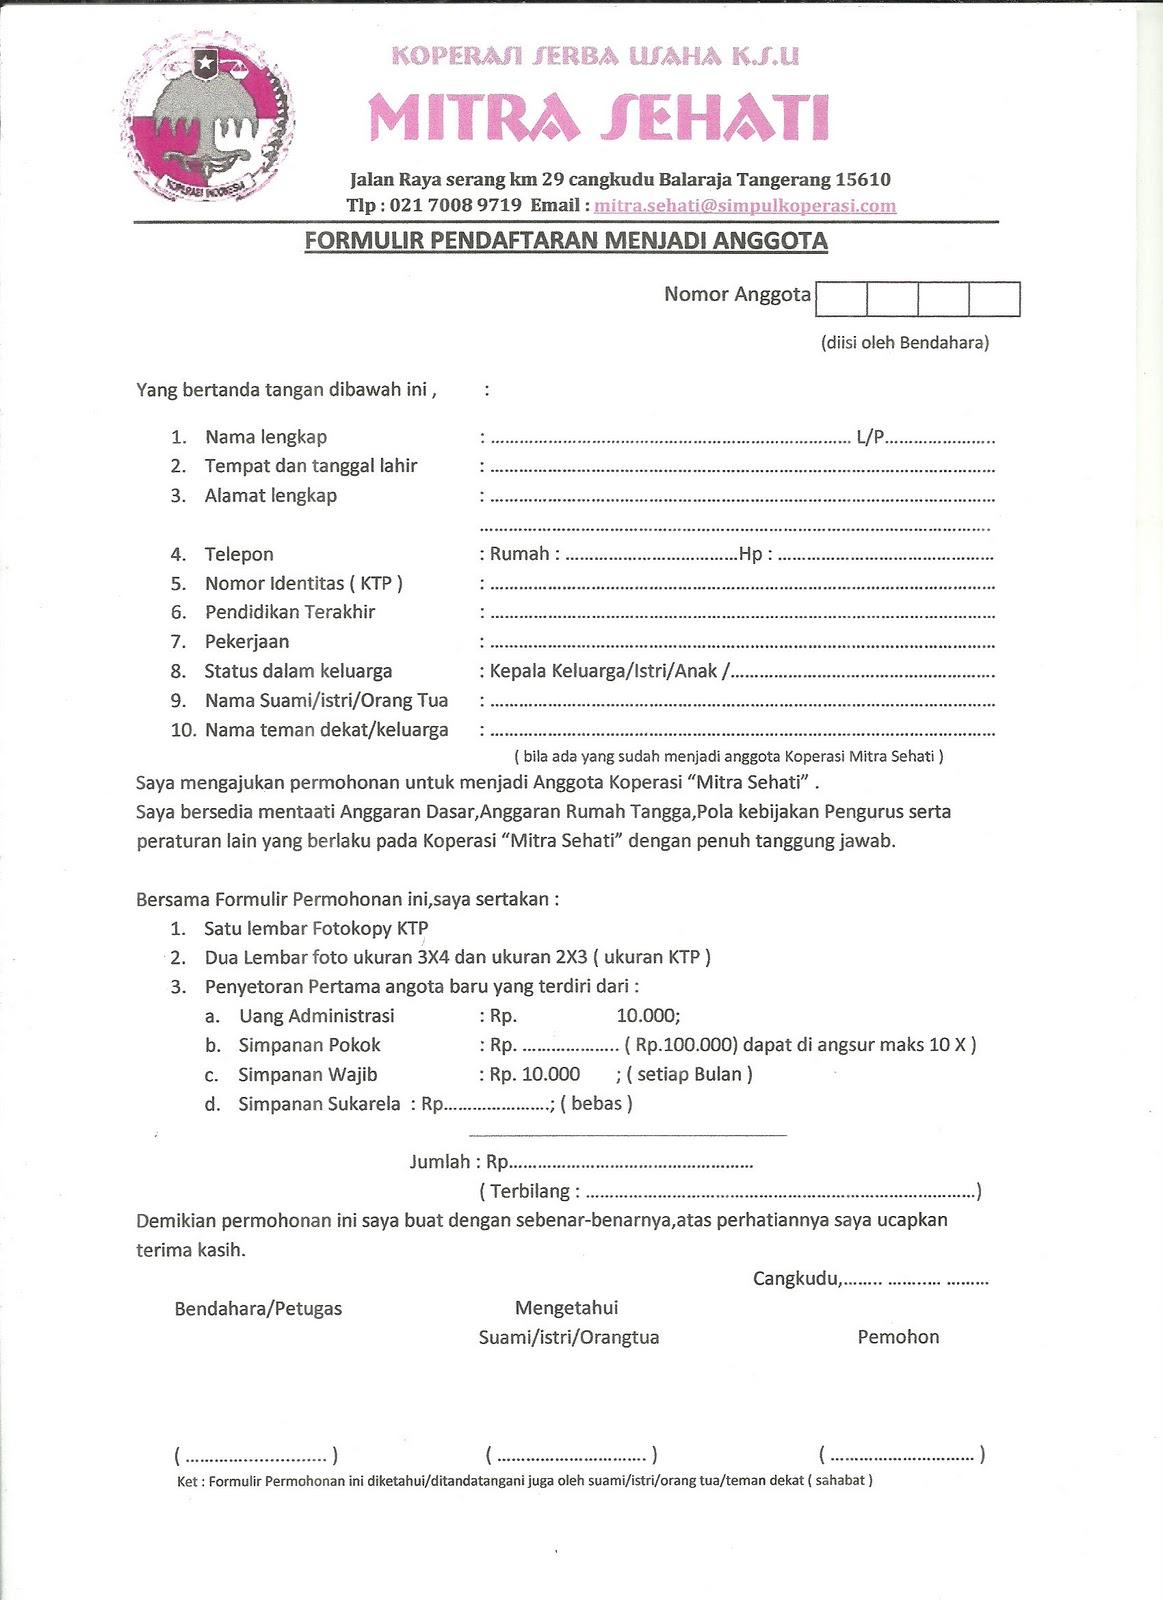 Contoh Formulir Dukungan Calon Anggota Dpd Contoh 290917